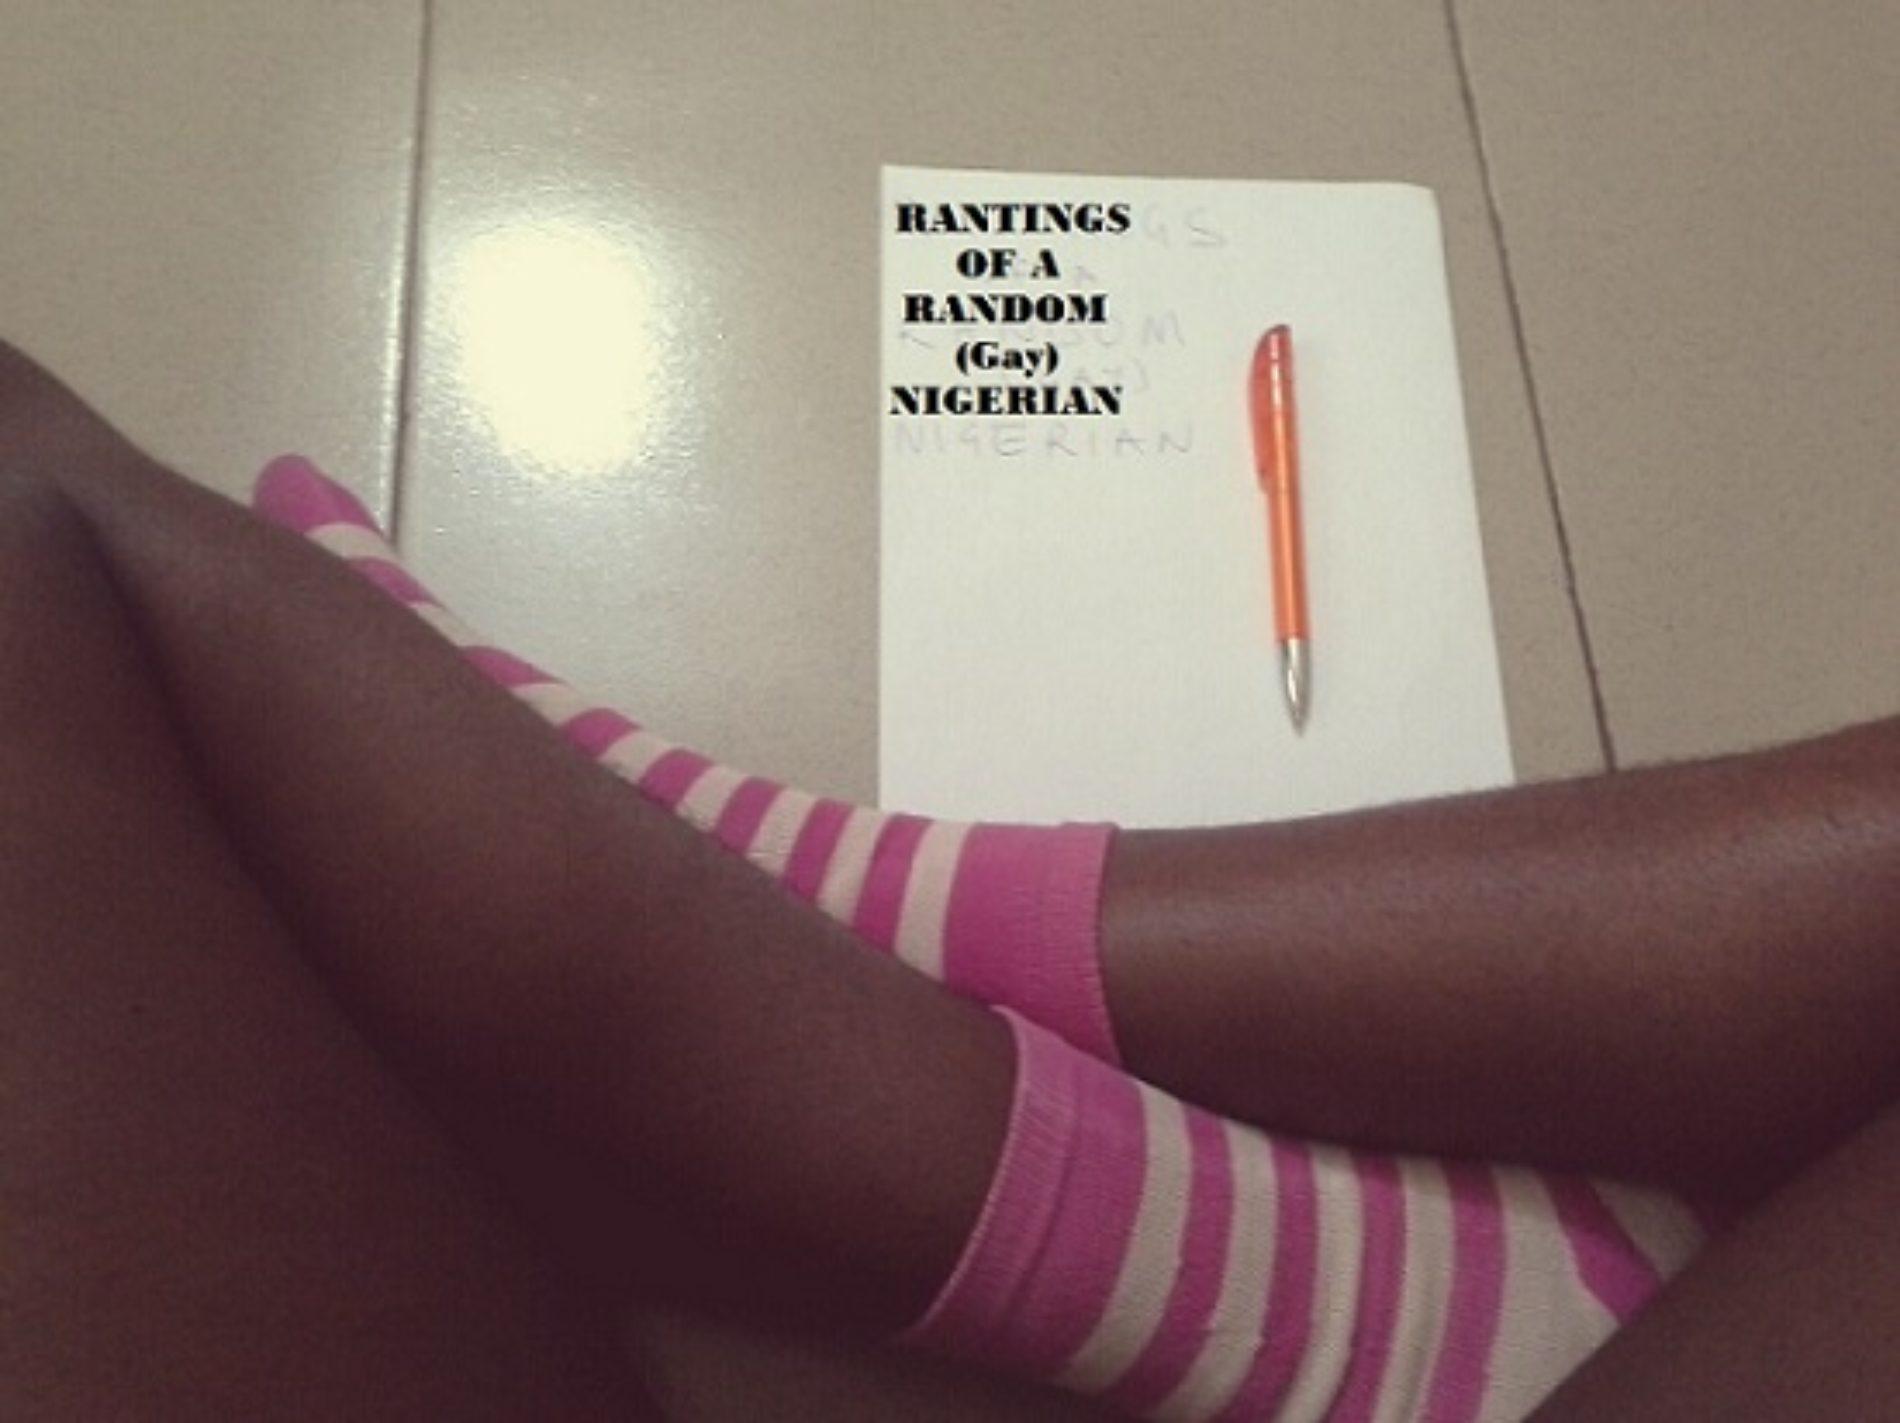 RANTINGS OF A RANDOM (Gay) NIGERIAN (Entry 52)